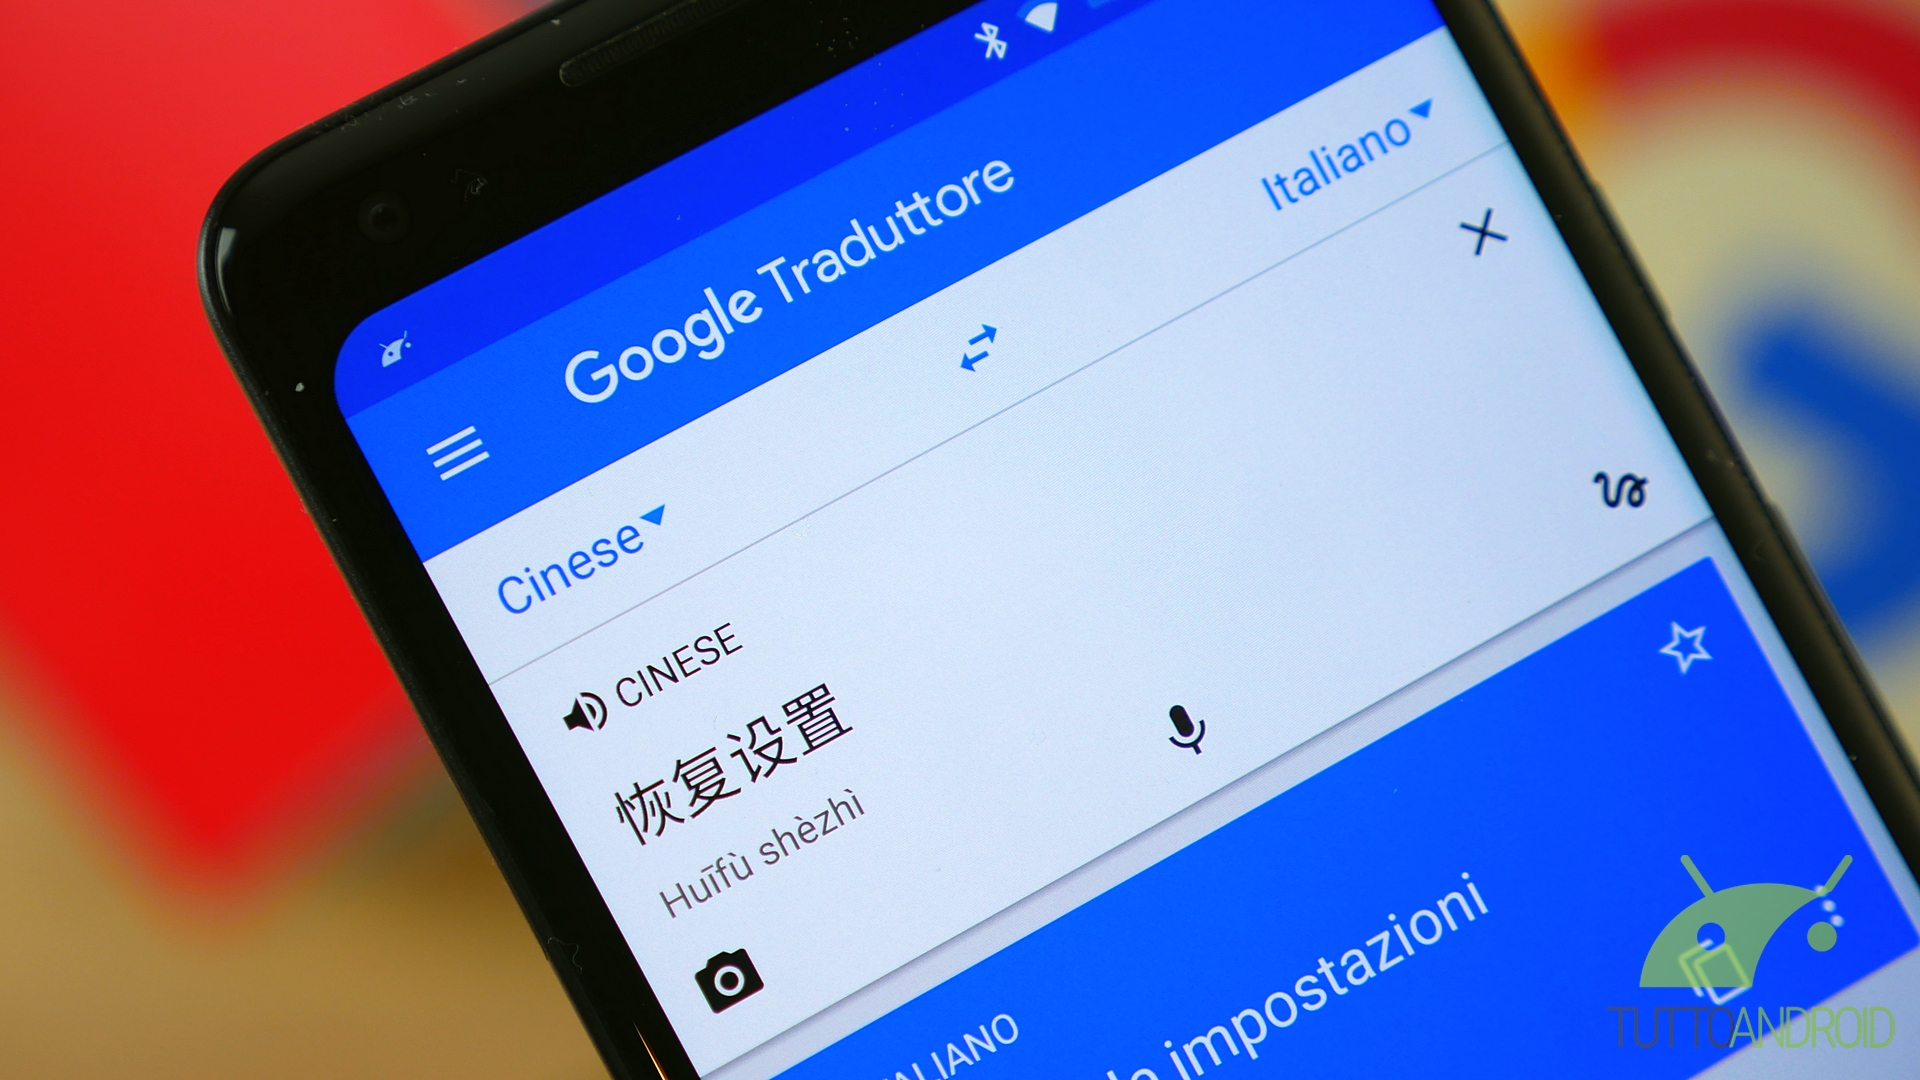 scaricare in inglese google traduttore